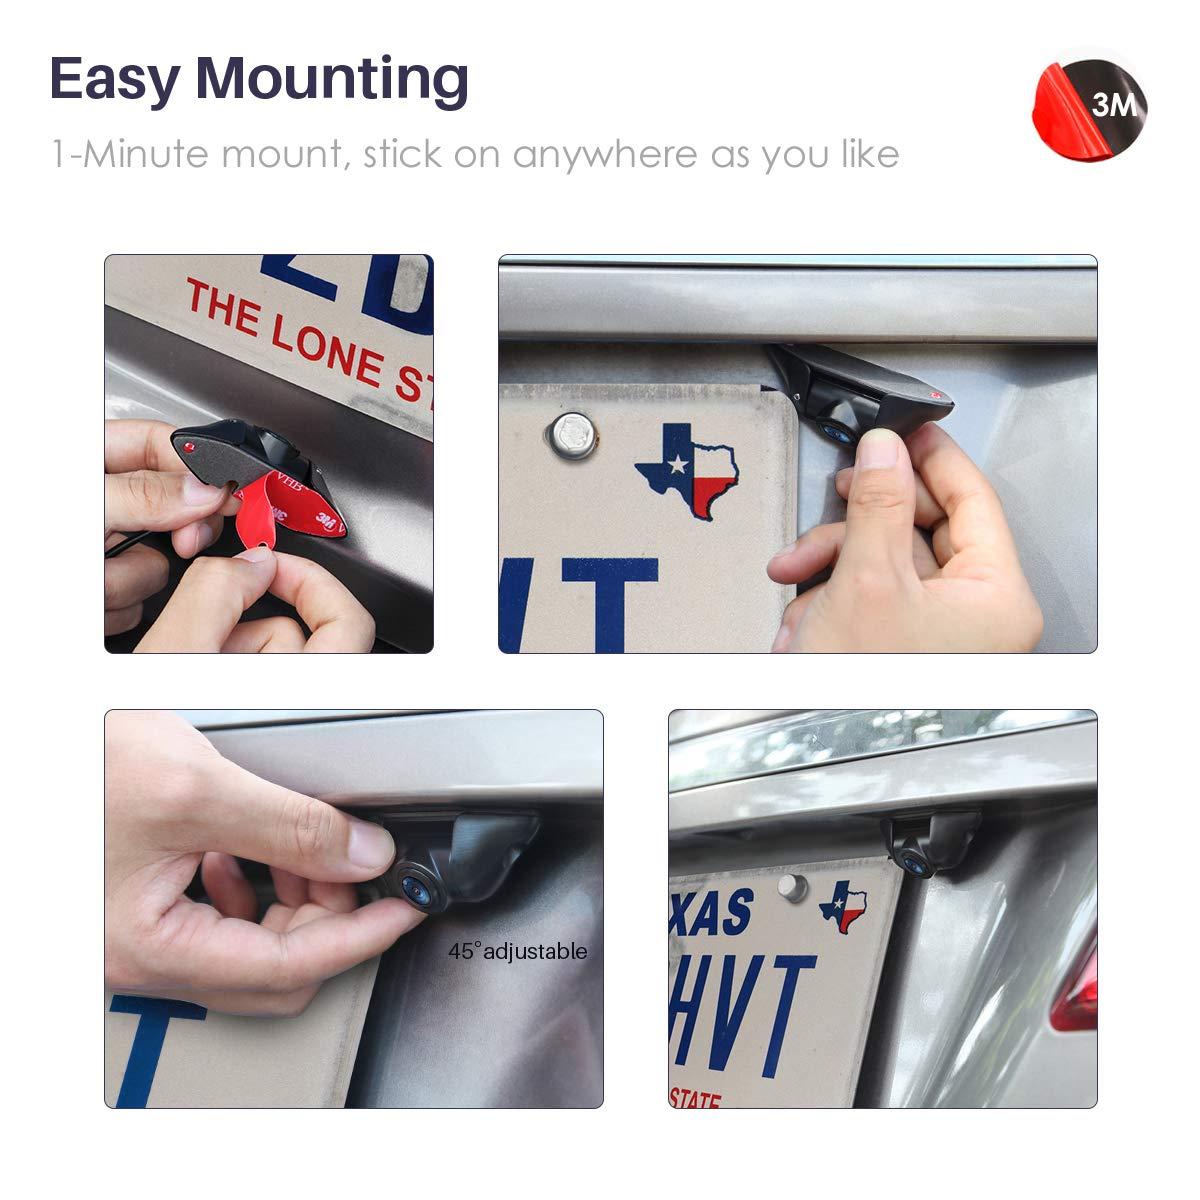 Airysee AS-205B Mini estilo repoker 600TVL Full HD videocámara CCD vulnerabilidades para coche reproductor de DVD Monitor del coche: Amazon.es: Electrónica